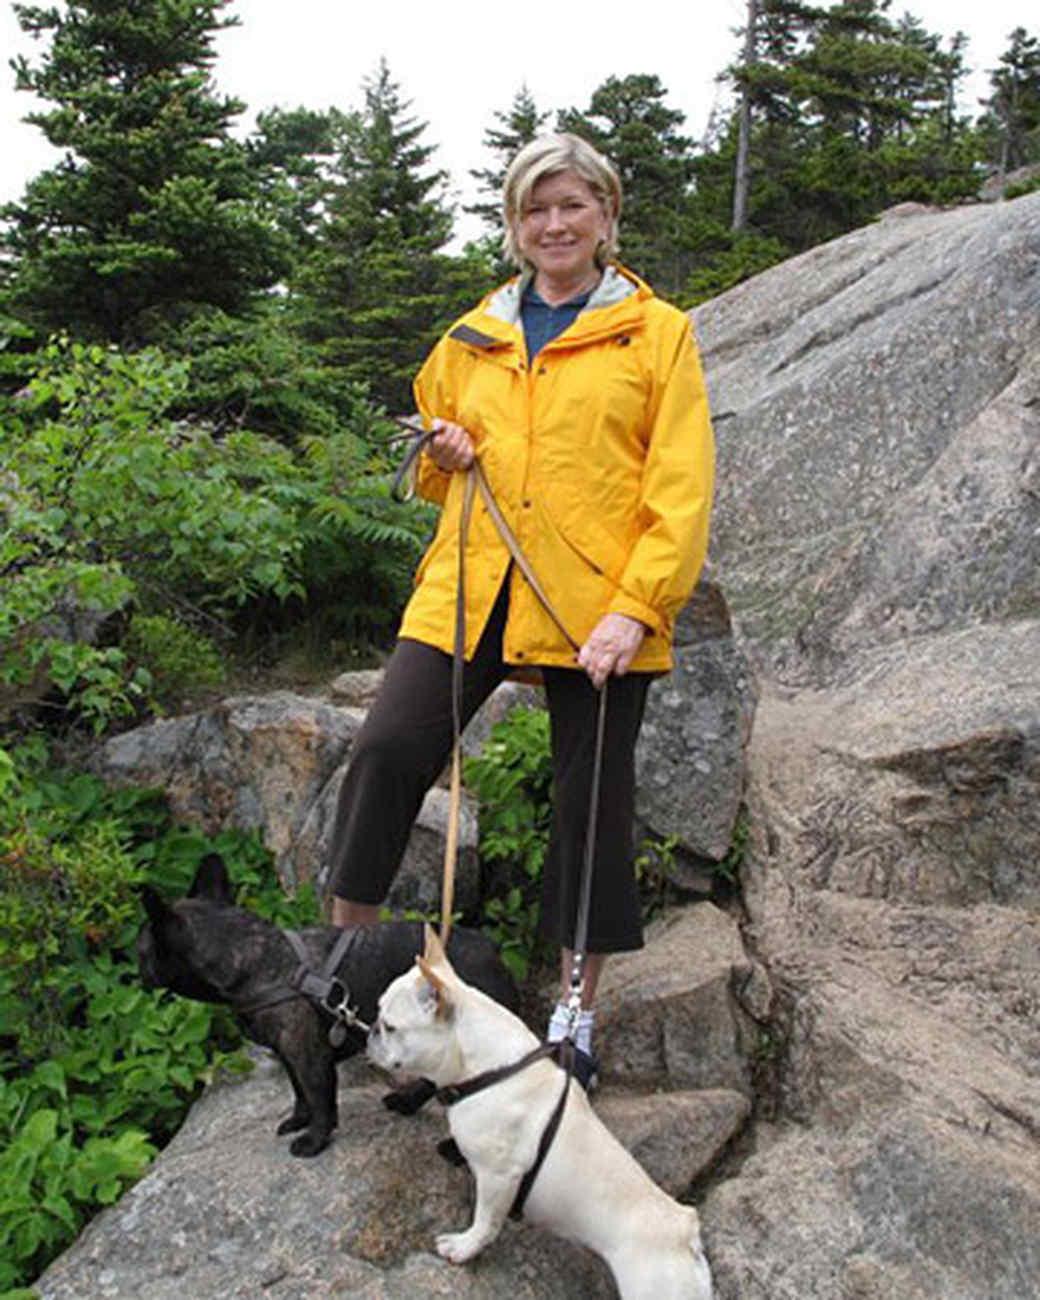 pets_best_wag_hiking2.jpg